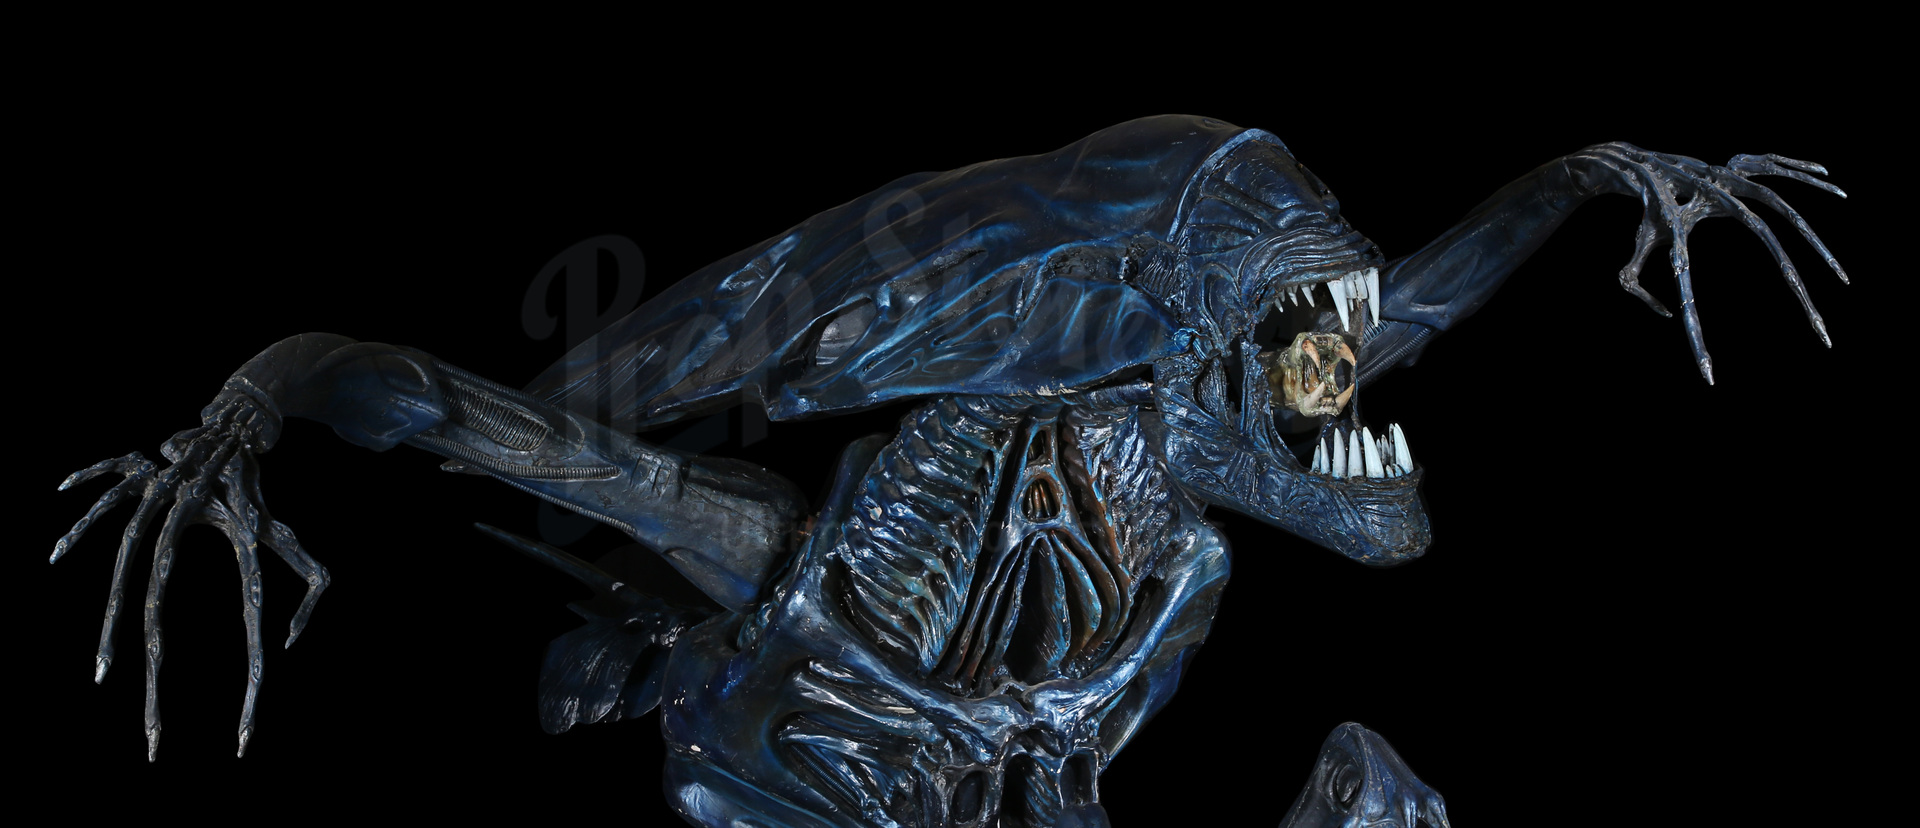 ALIENS (1986) - Full-size Promotional Alien Queen - Image 11 of 38